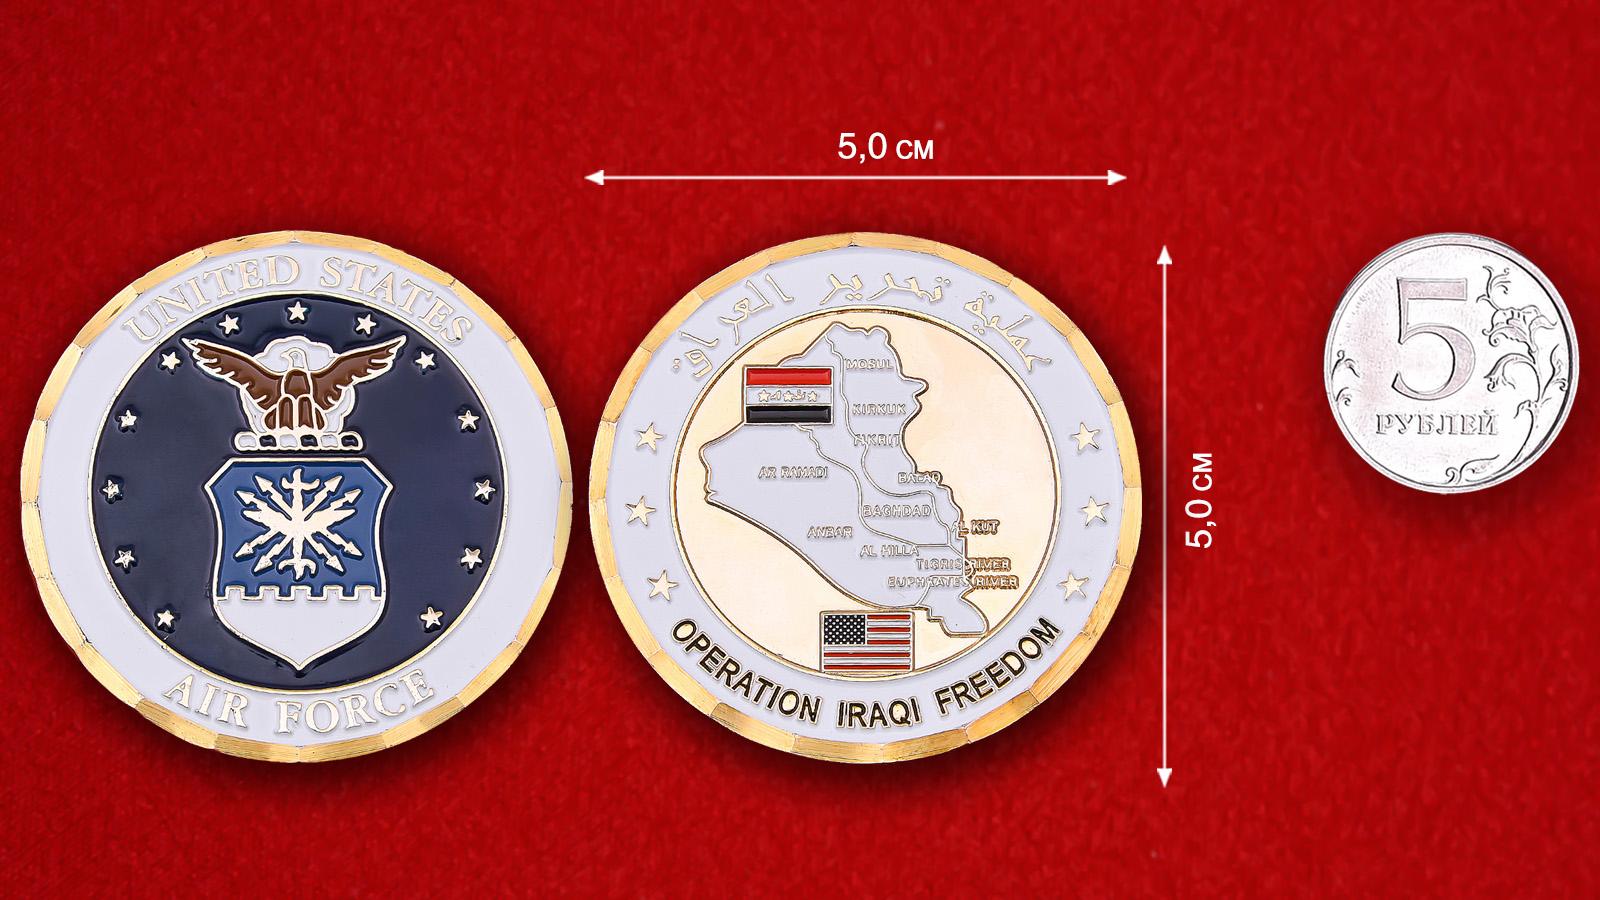 USAF Operation Iraqi Freedom Challenge Coin